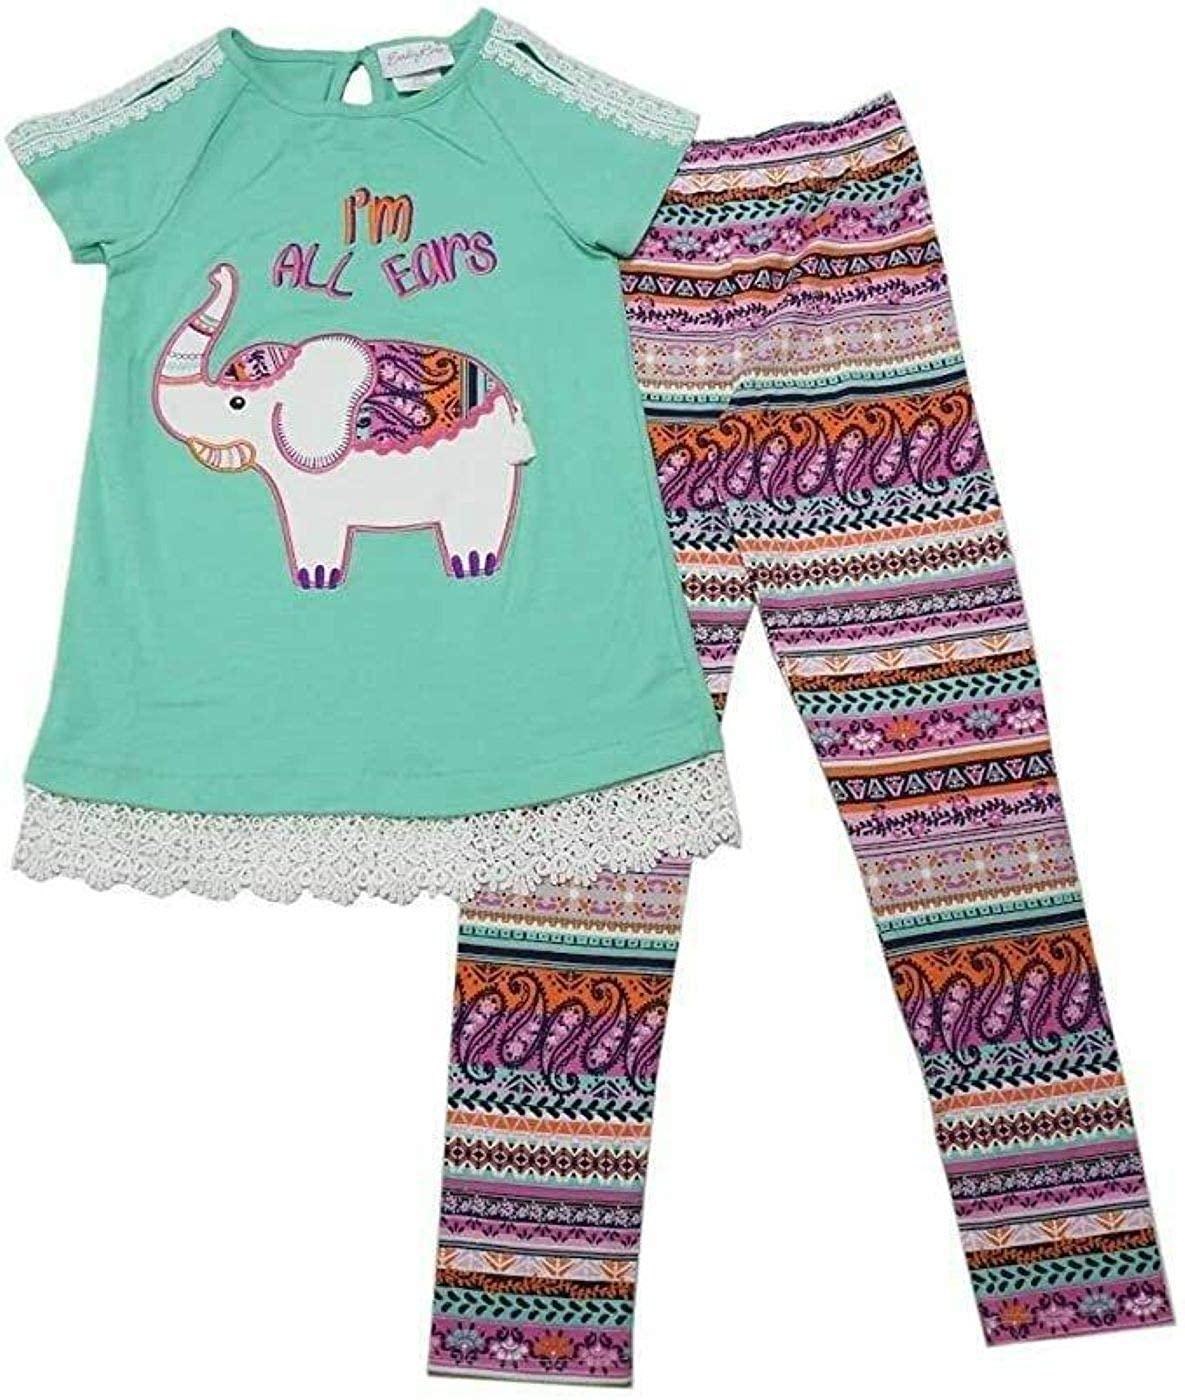 Emily Rose Leggings 2 PC Girls Set Elephant, Mint Color, Size 4